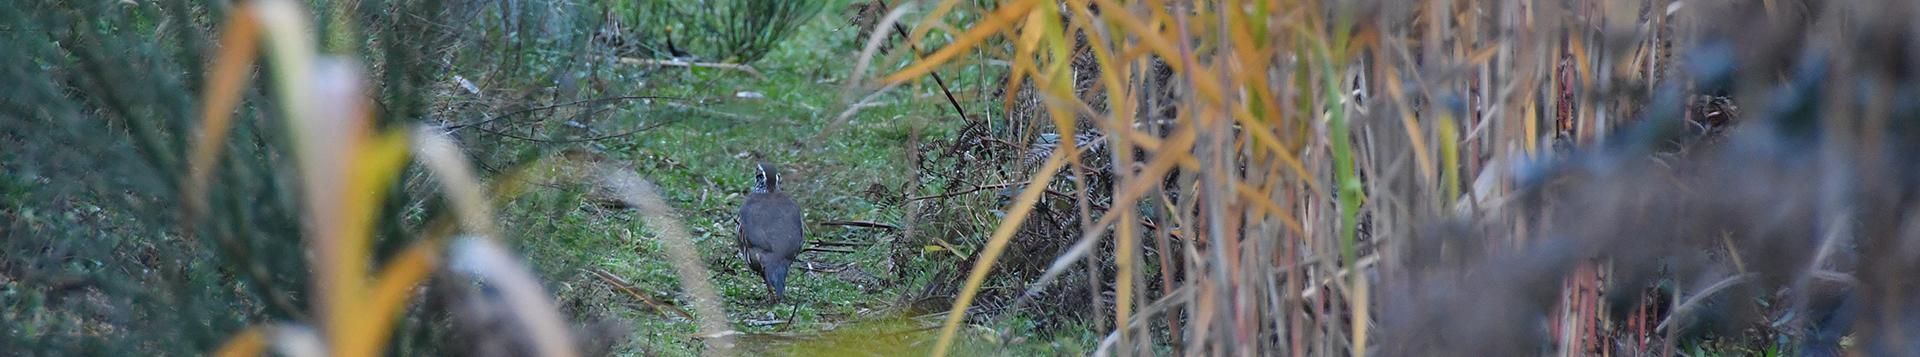 Tarifs chasse - Domaine des Enfreins